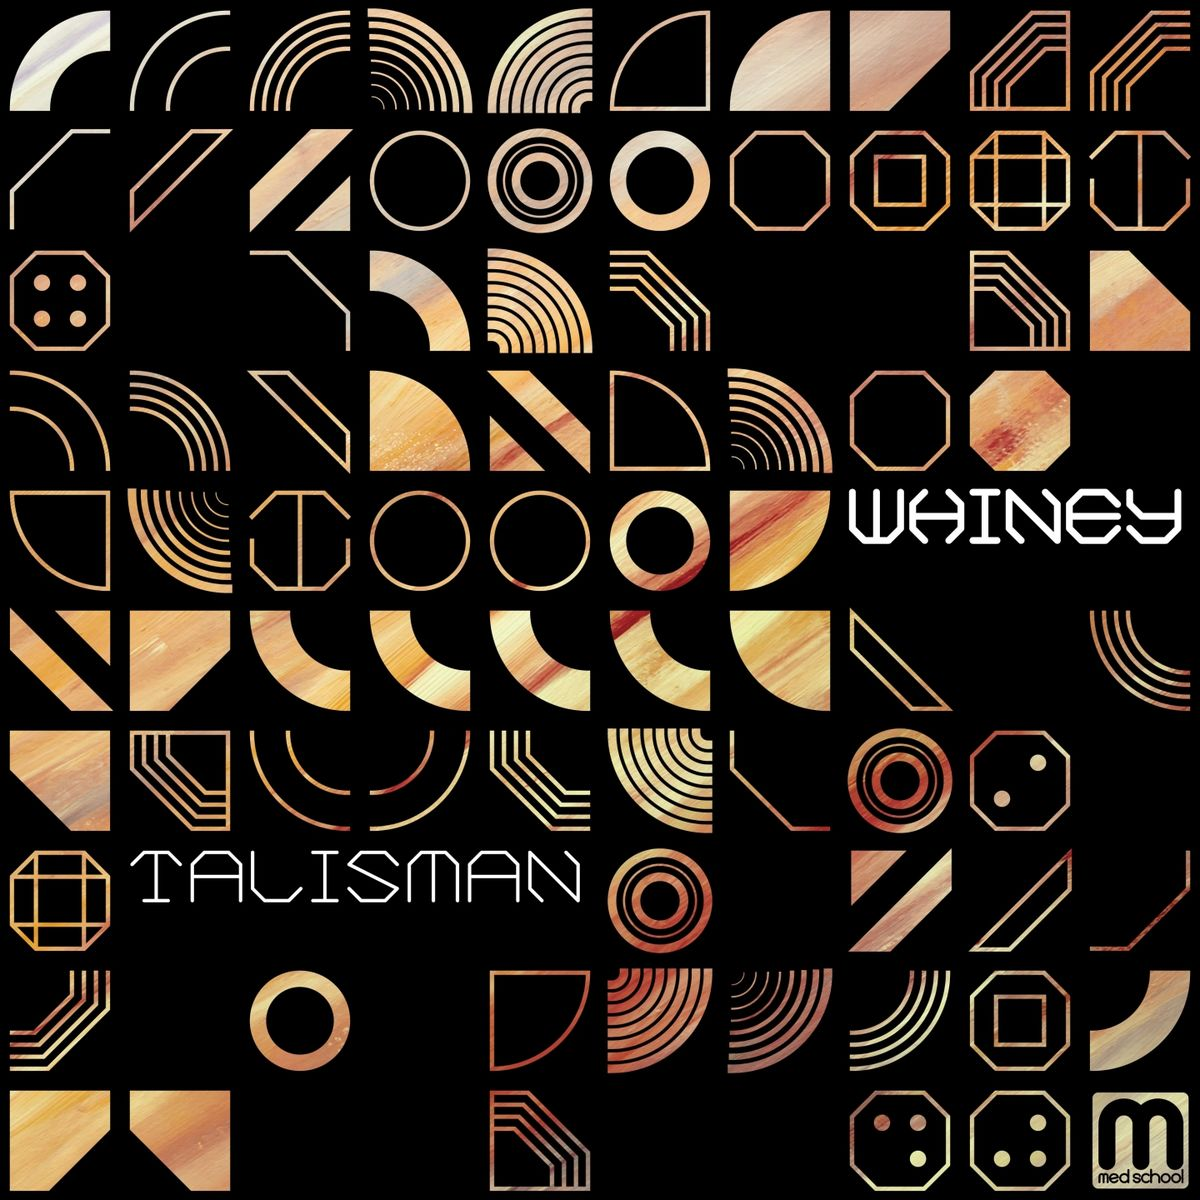 Whiney - Talisman (Original Mix)